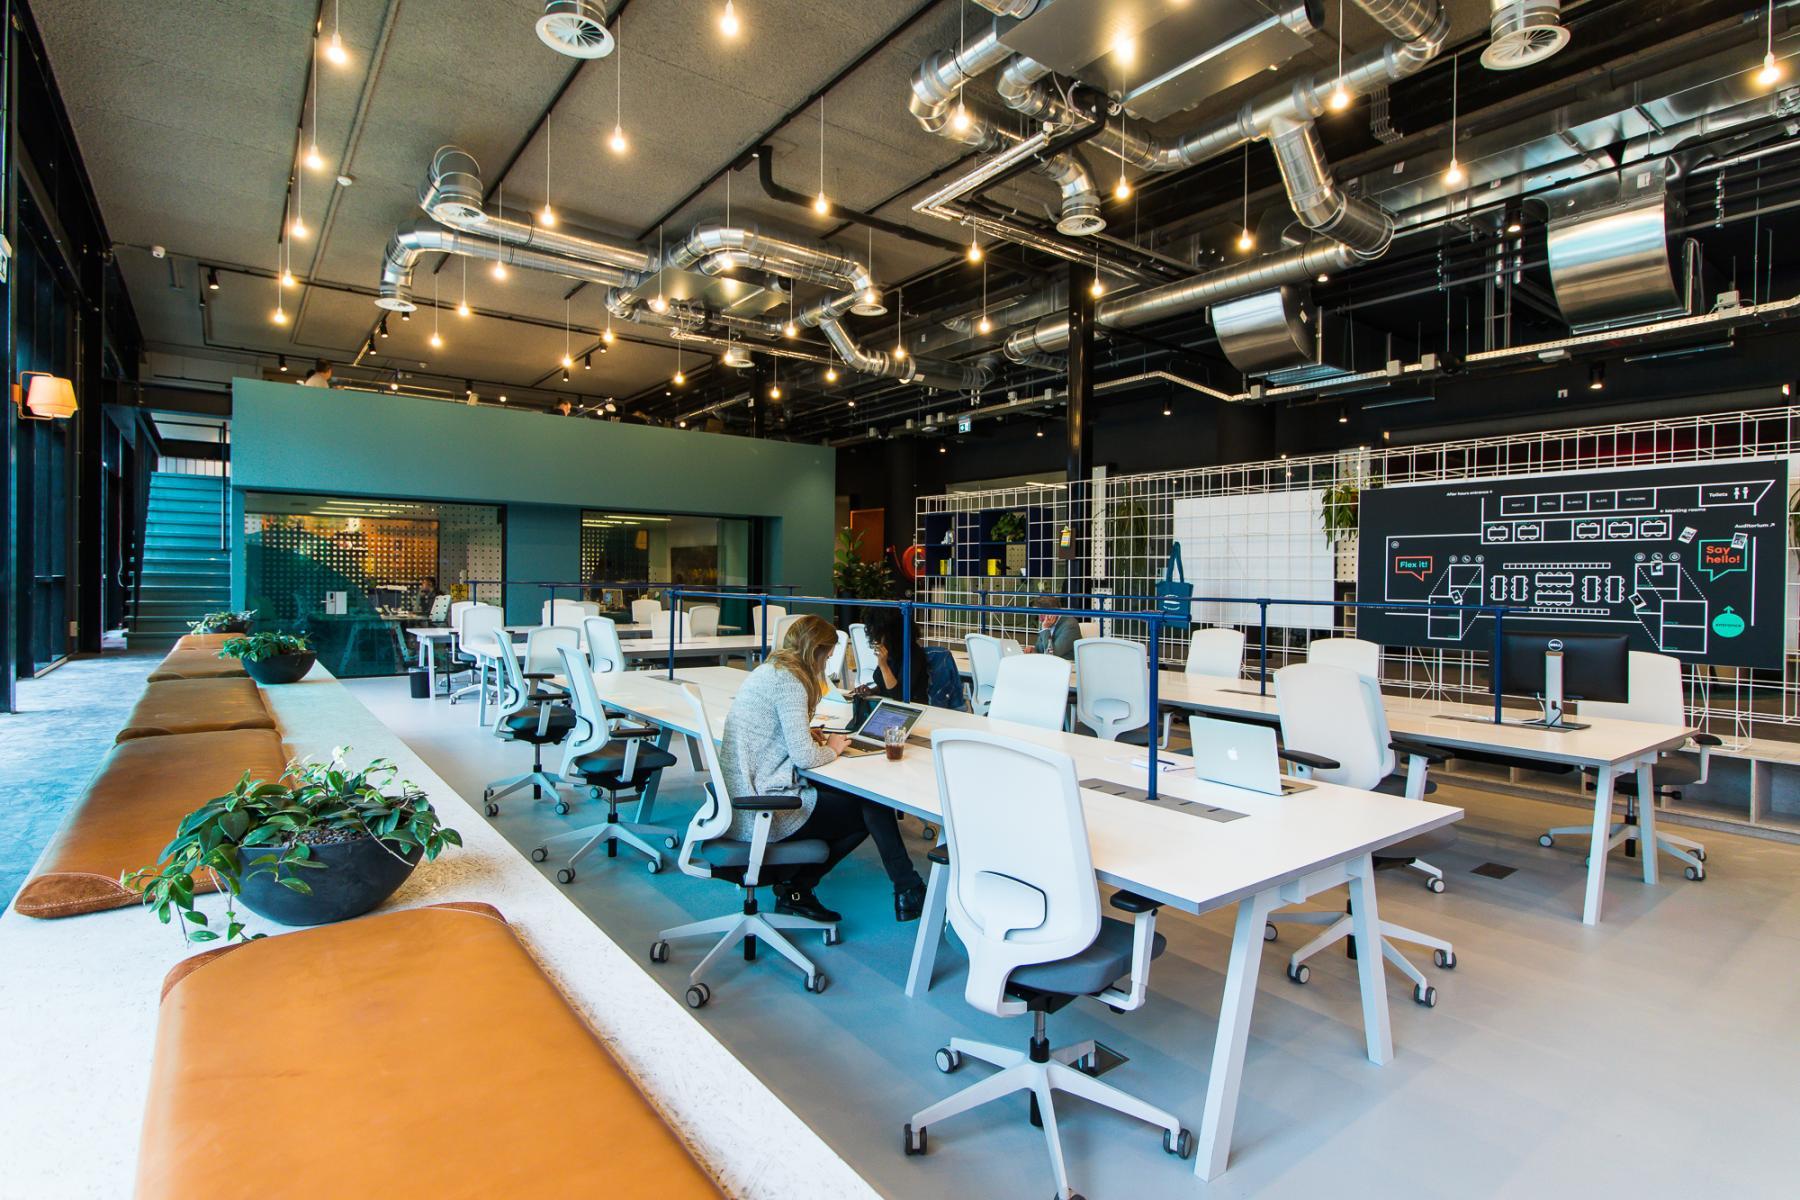 Cowork SKEPP C4 activity based kantoorinrichting